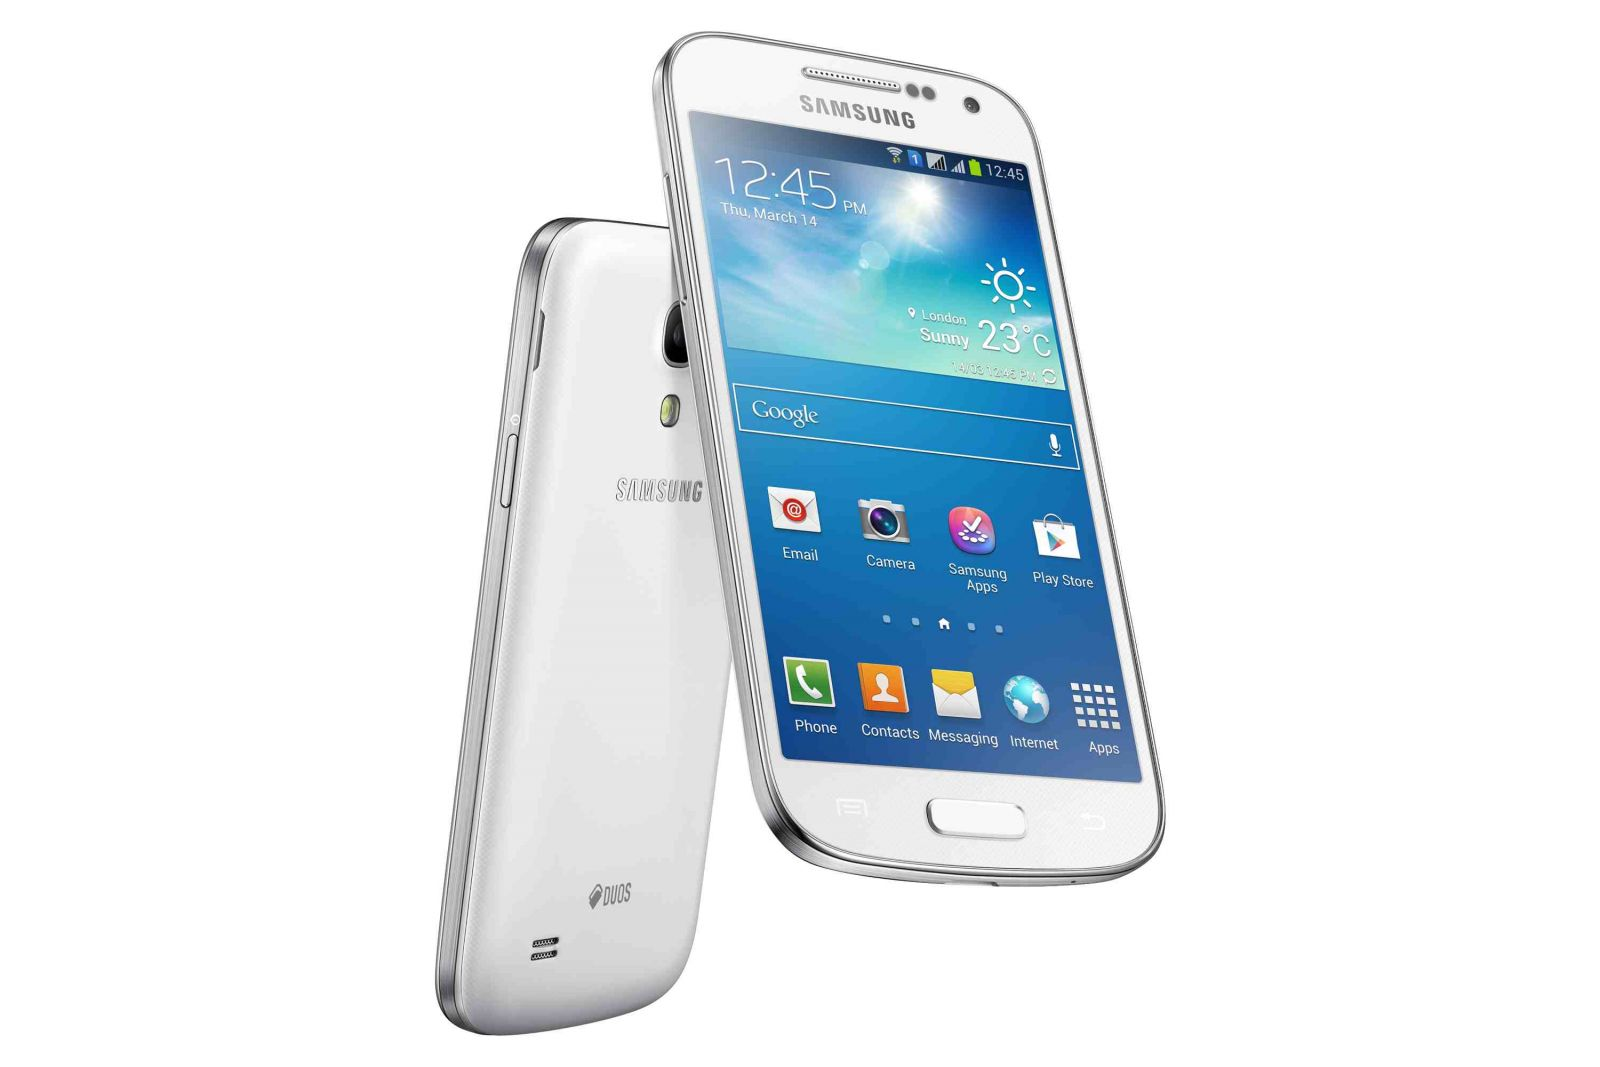 Samsung Galaxy S4 Mini: все для счастливой жизни - фото №2